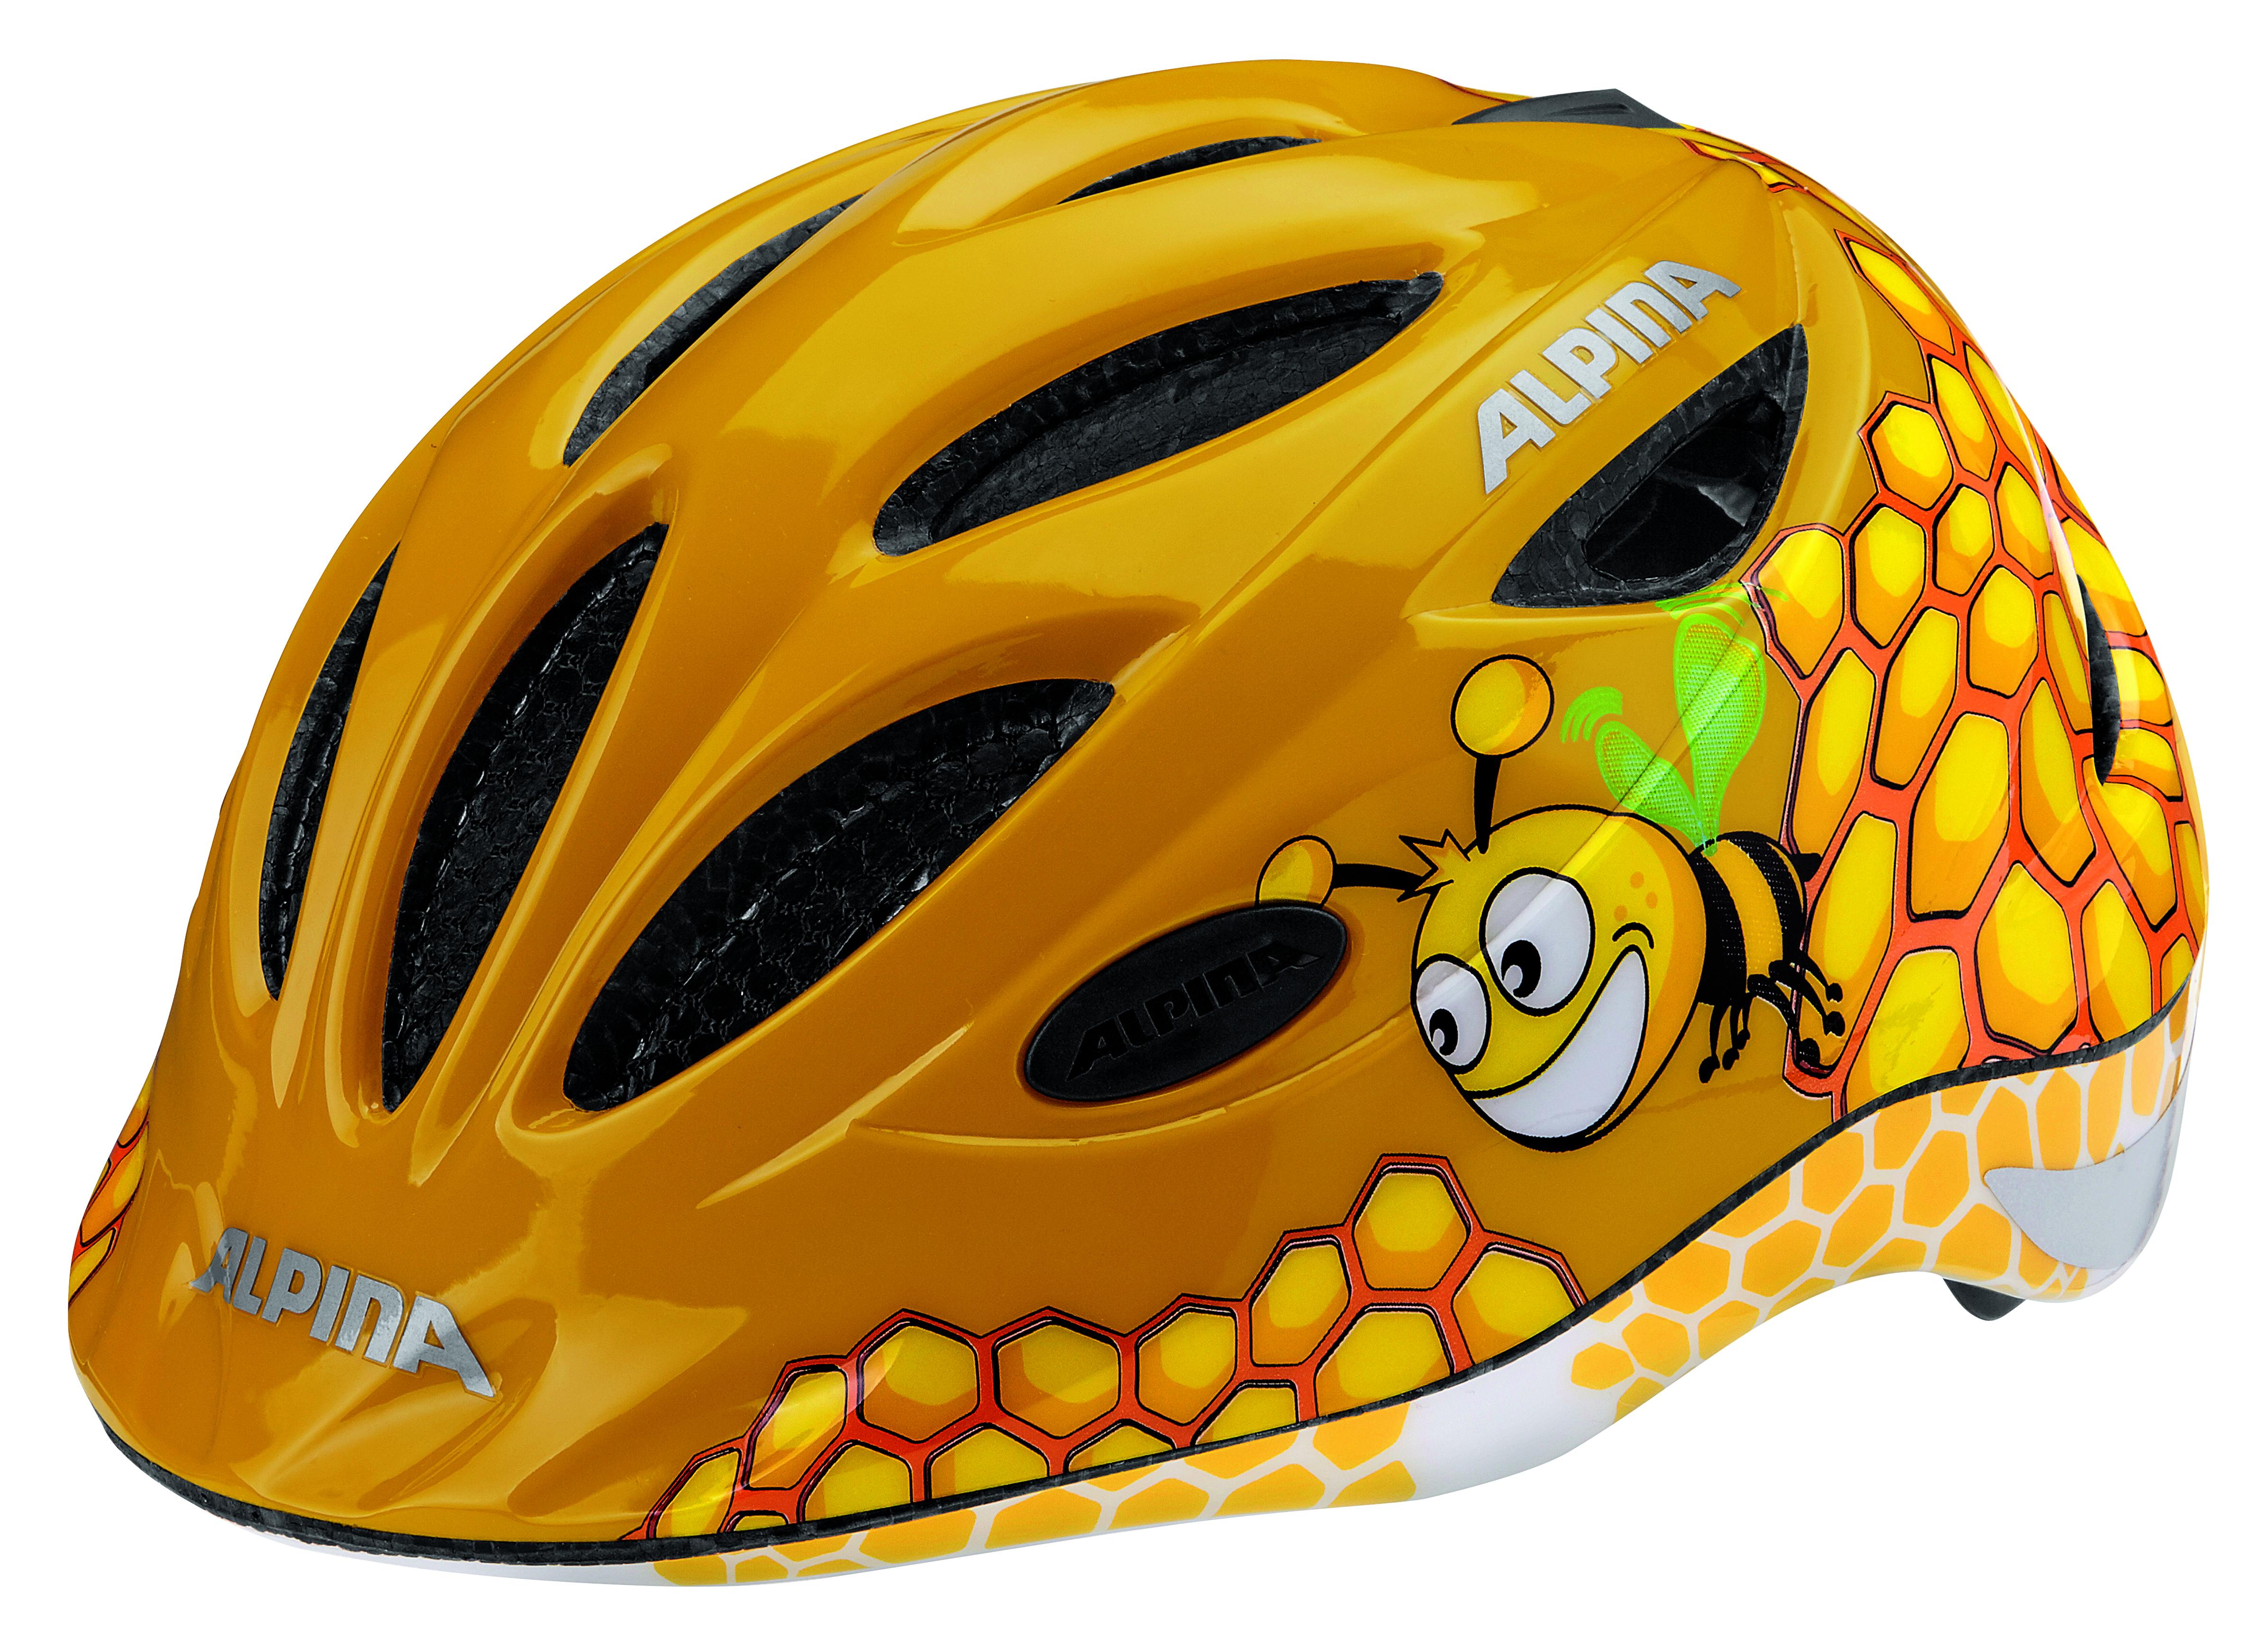 Велошлем Alpina 2018 Gamma 2.0 Flash honey bee, Велошлемы - арт. 1017130356